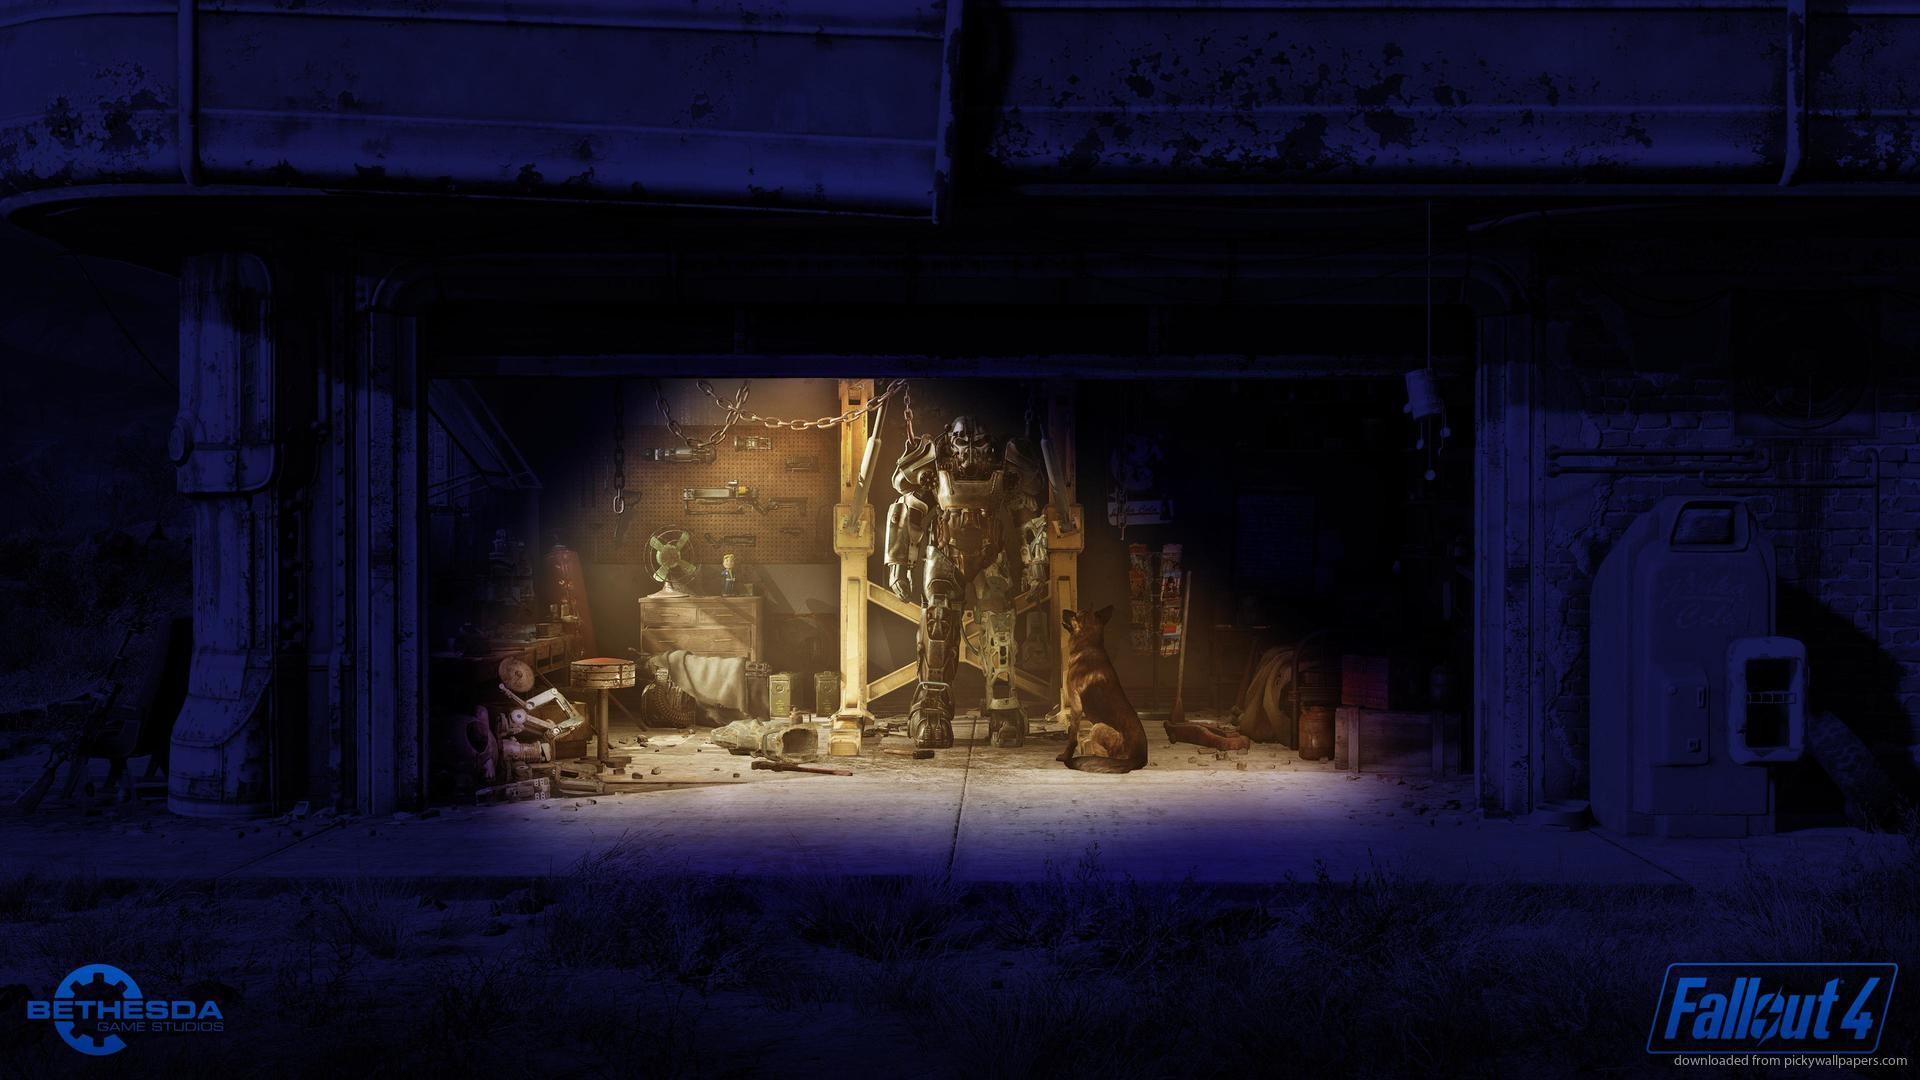 2560×1440 Fallout 4 Garage Night Wallpaper wallpaper